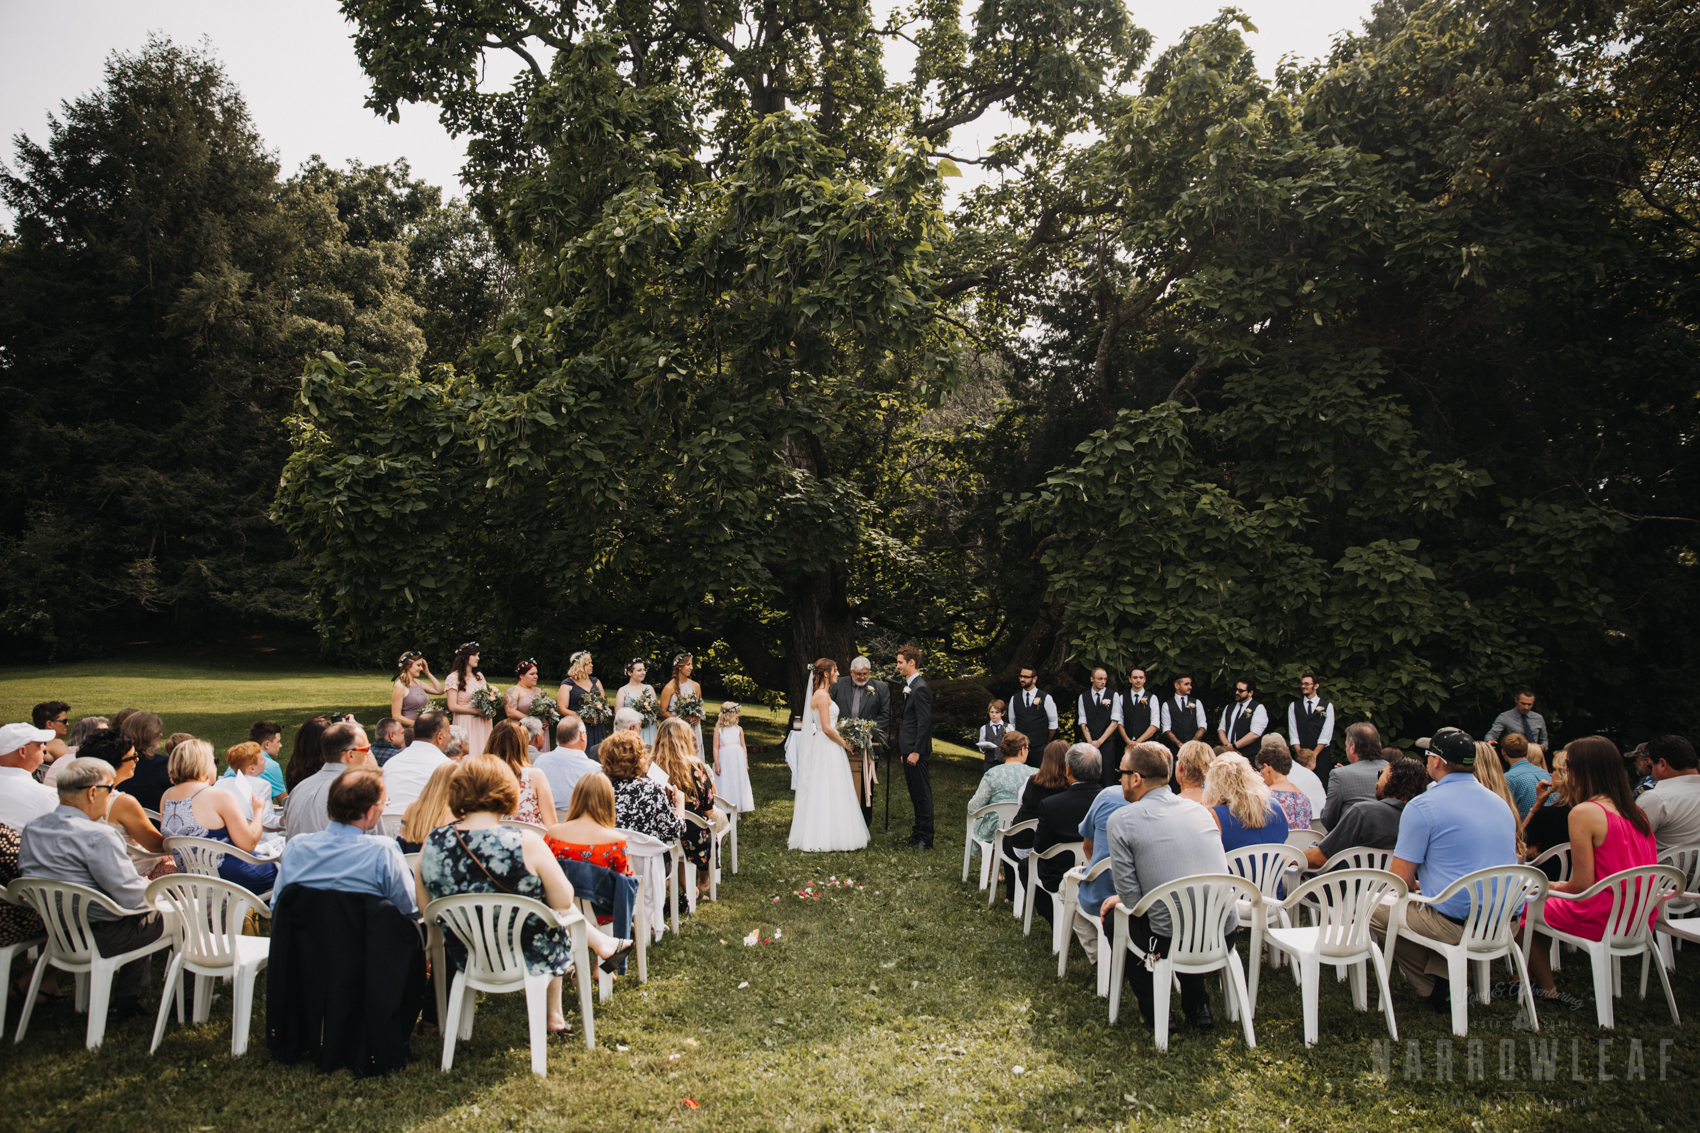 the-hilltop-wi-summer-outdoor-tree-wedding-306.jpg